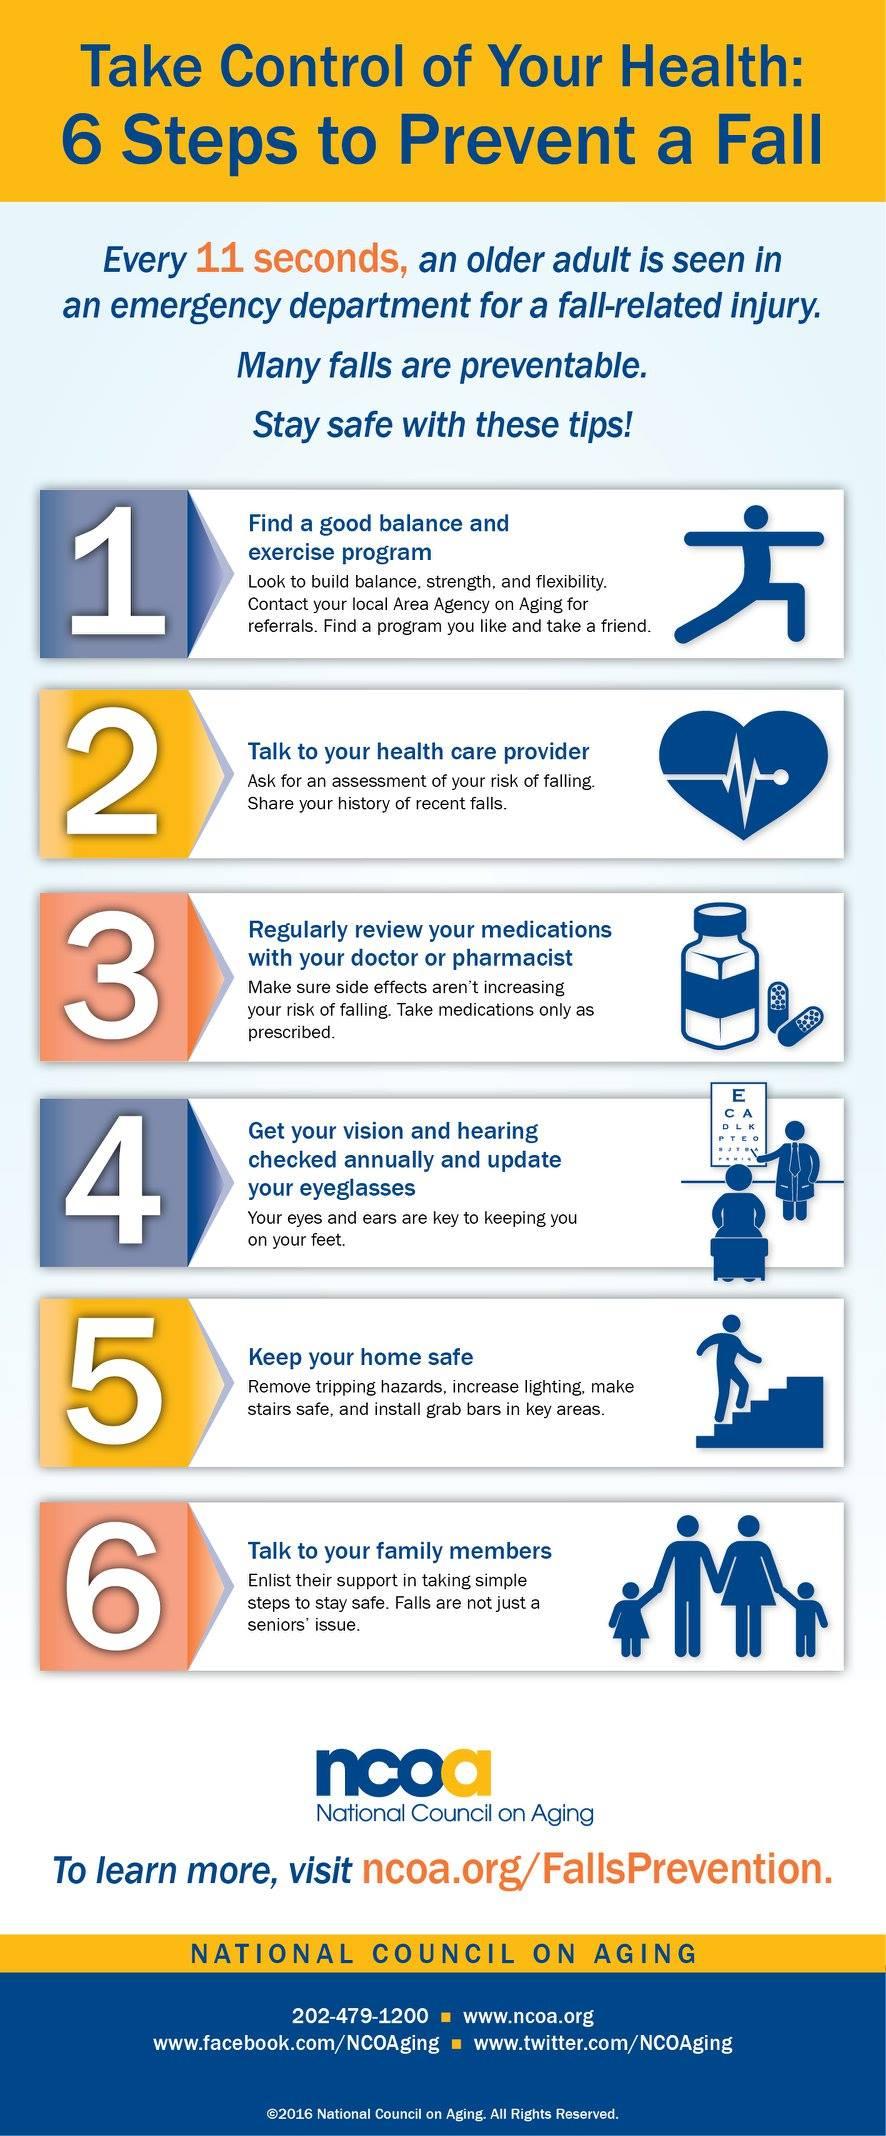 Falls Prevention on Vestibular System Disorders